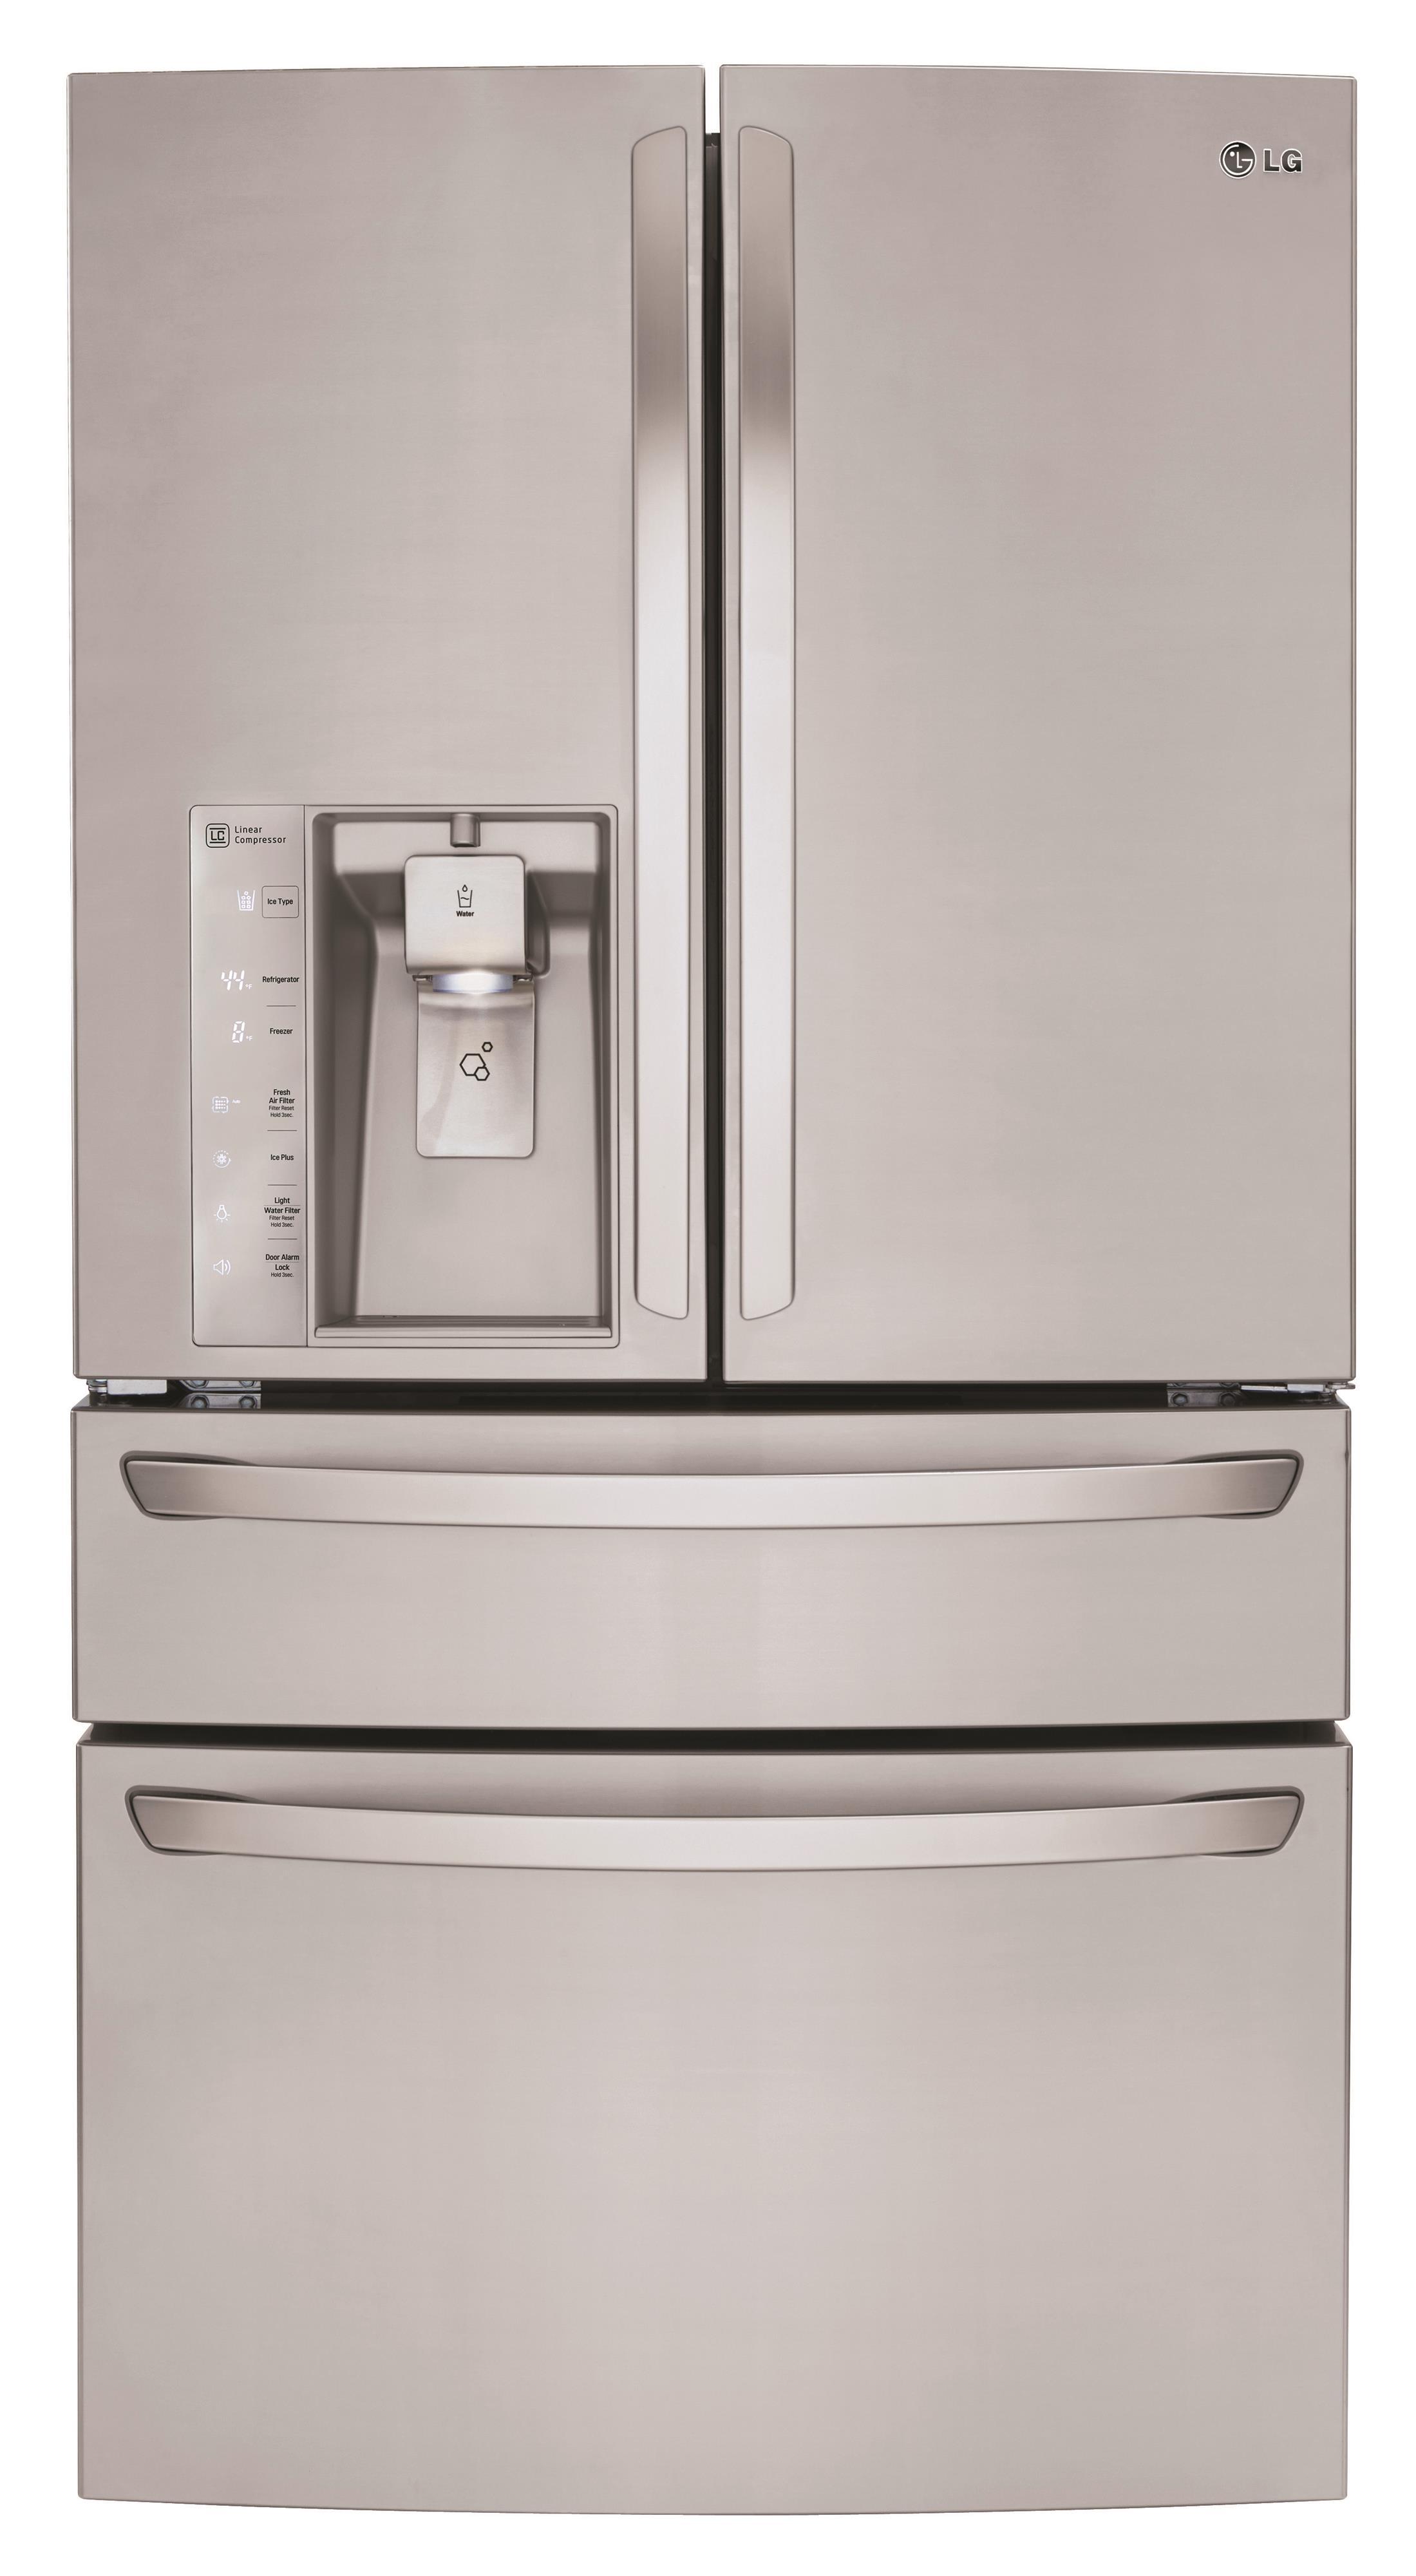 LG Appliances French Door Refrigerators 30 Cu. Ft. 4-Door French Door Refrigerator - Item Number: LMXS30786S